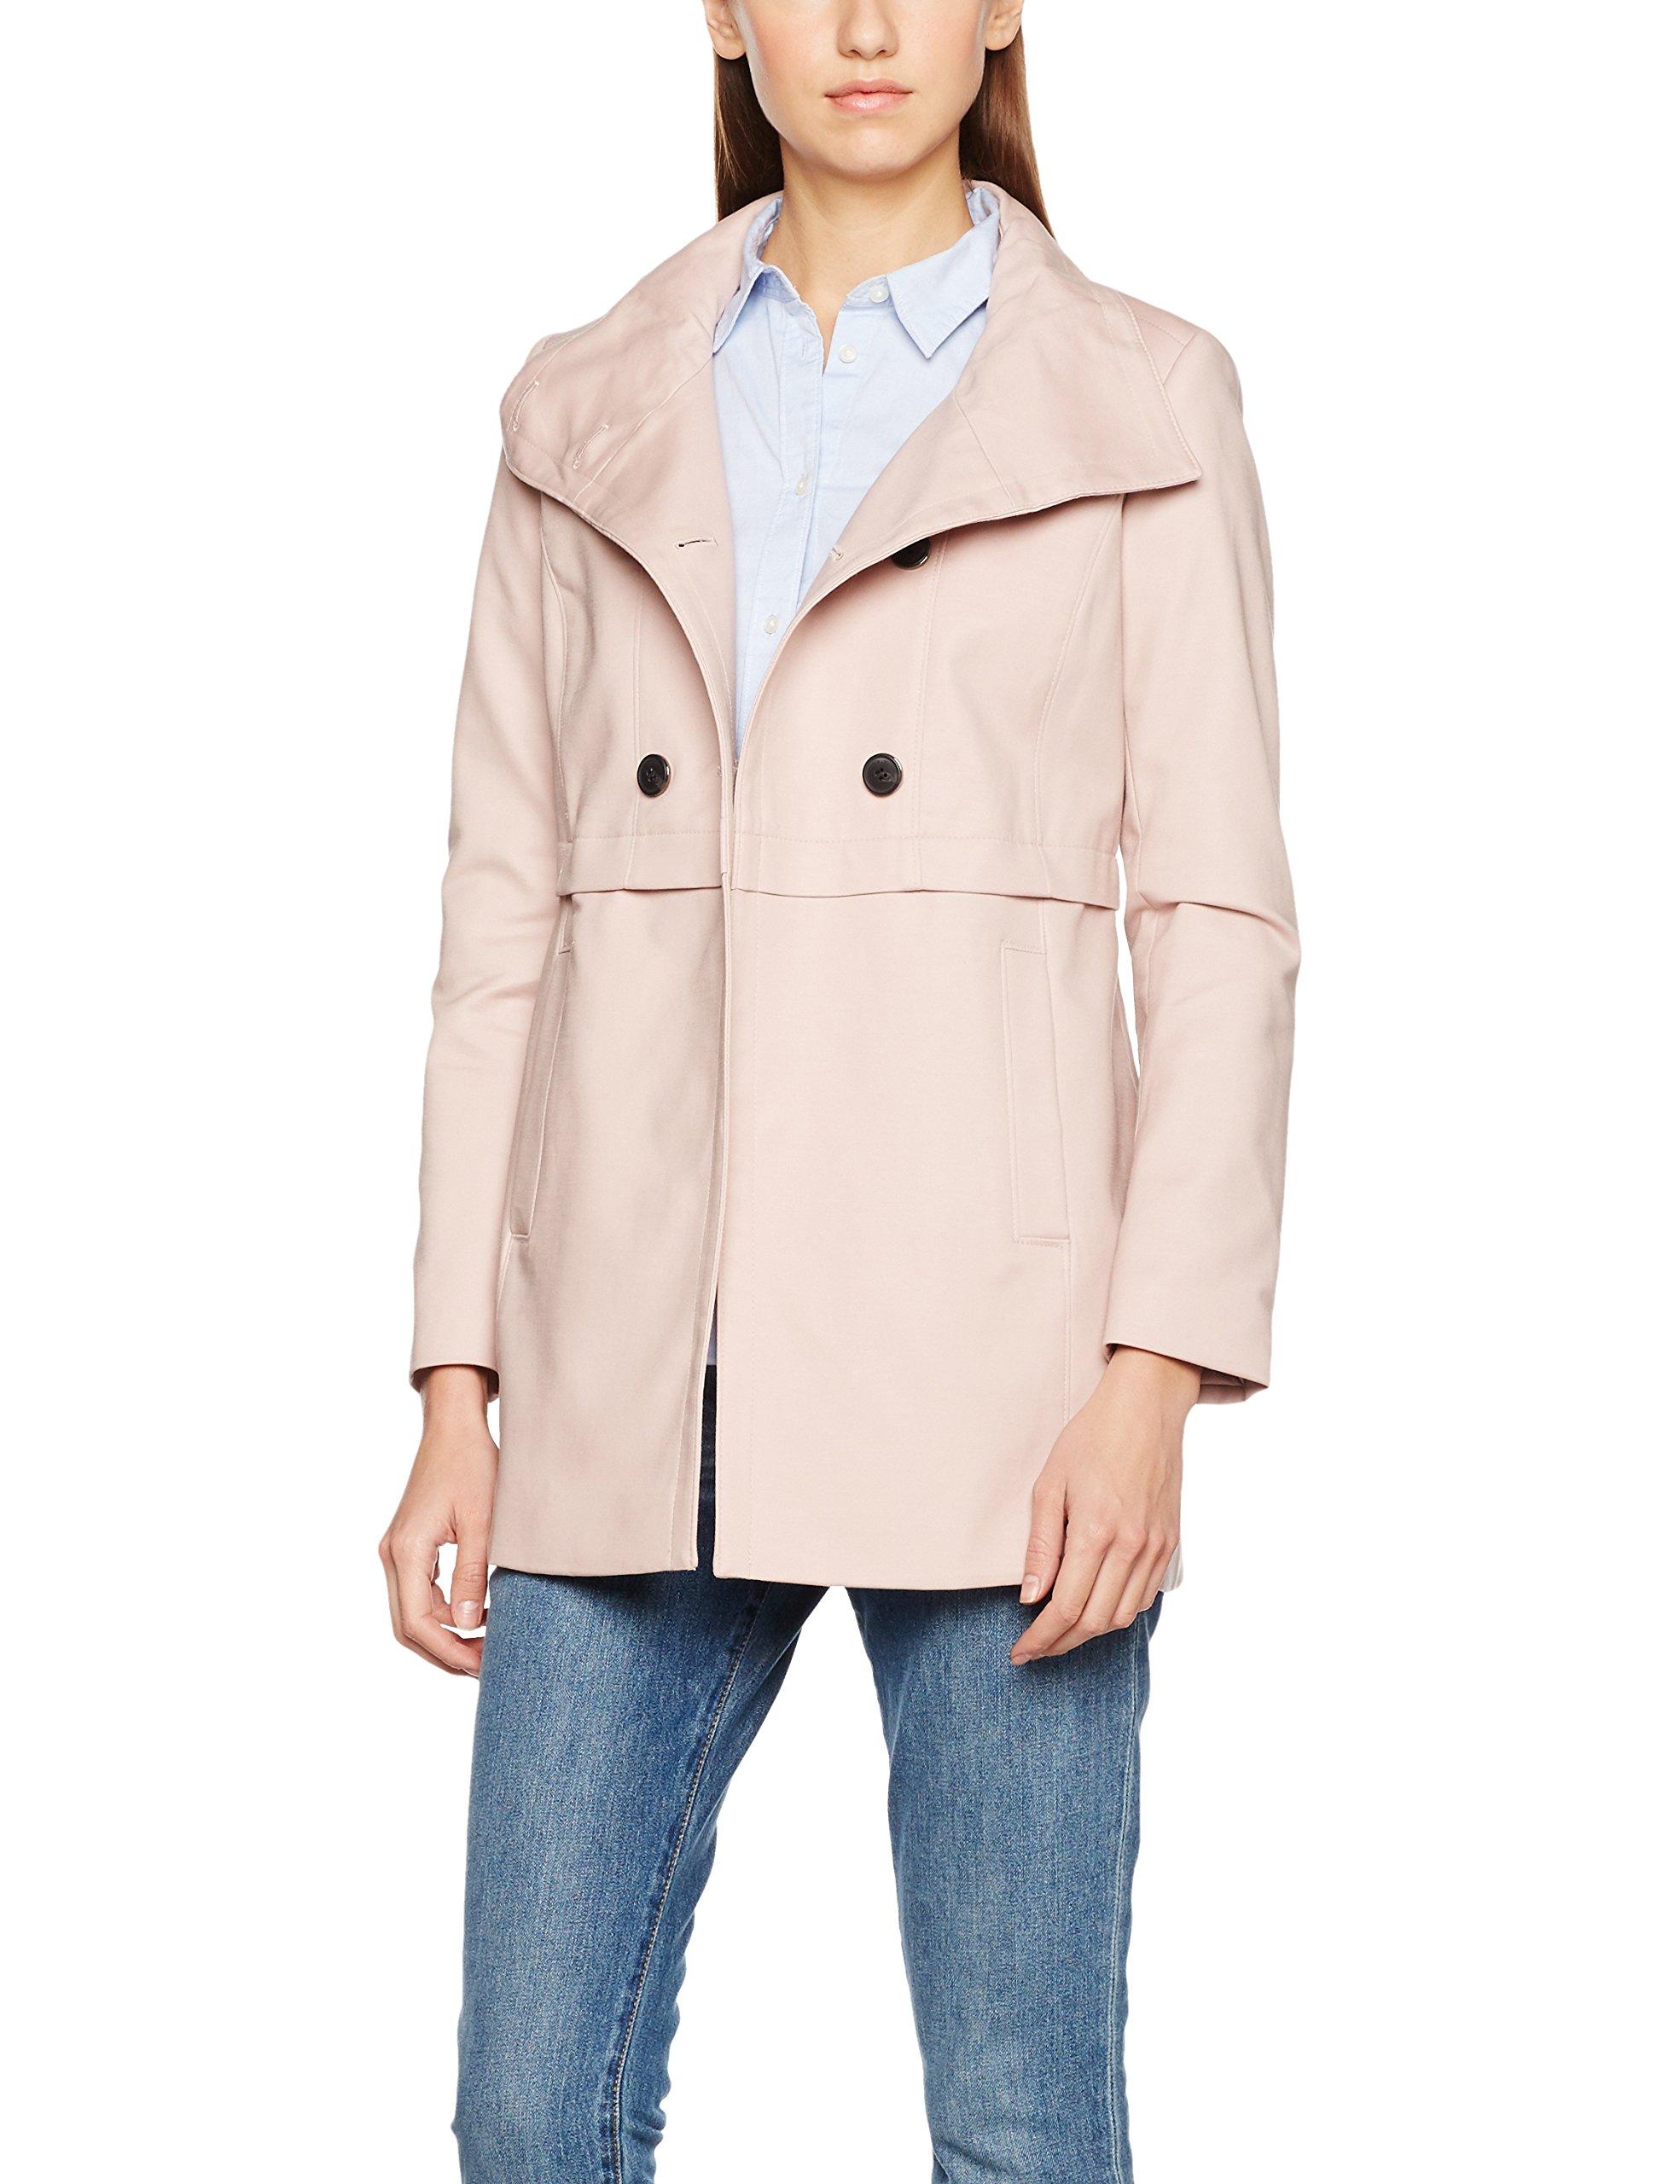 Damen MantelRosaold Pink Esprit 68040 Collection 126eo1g018 6bgvYyf7